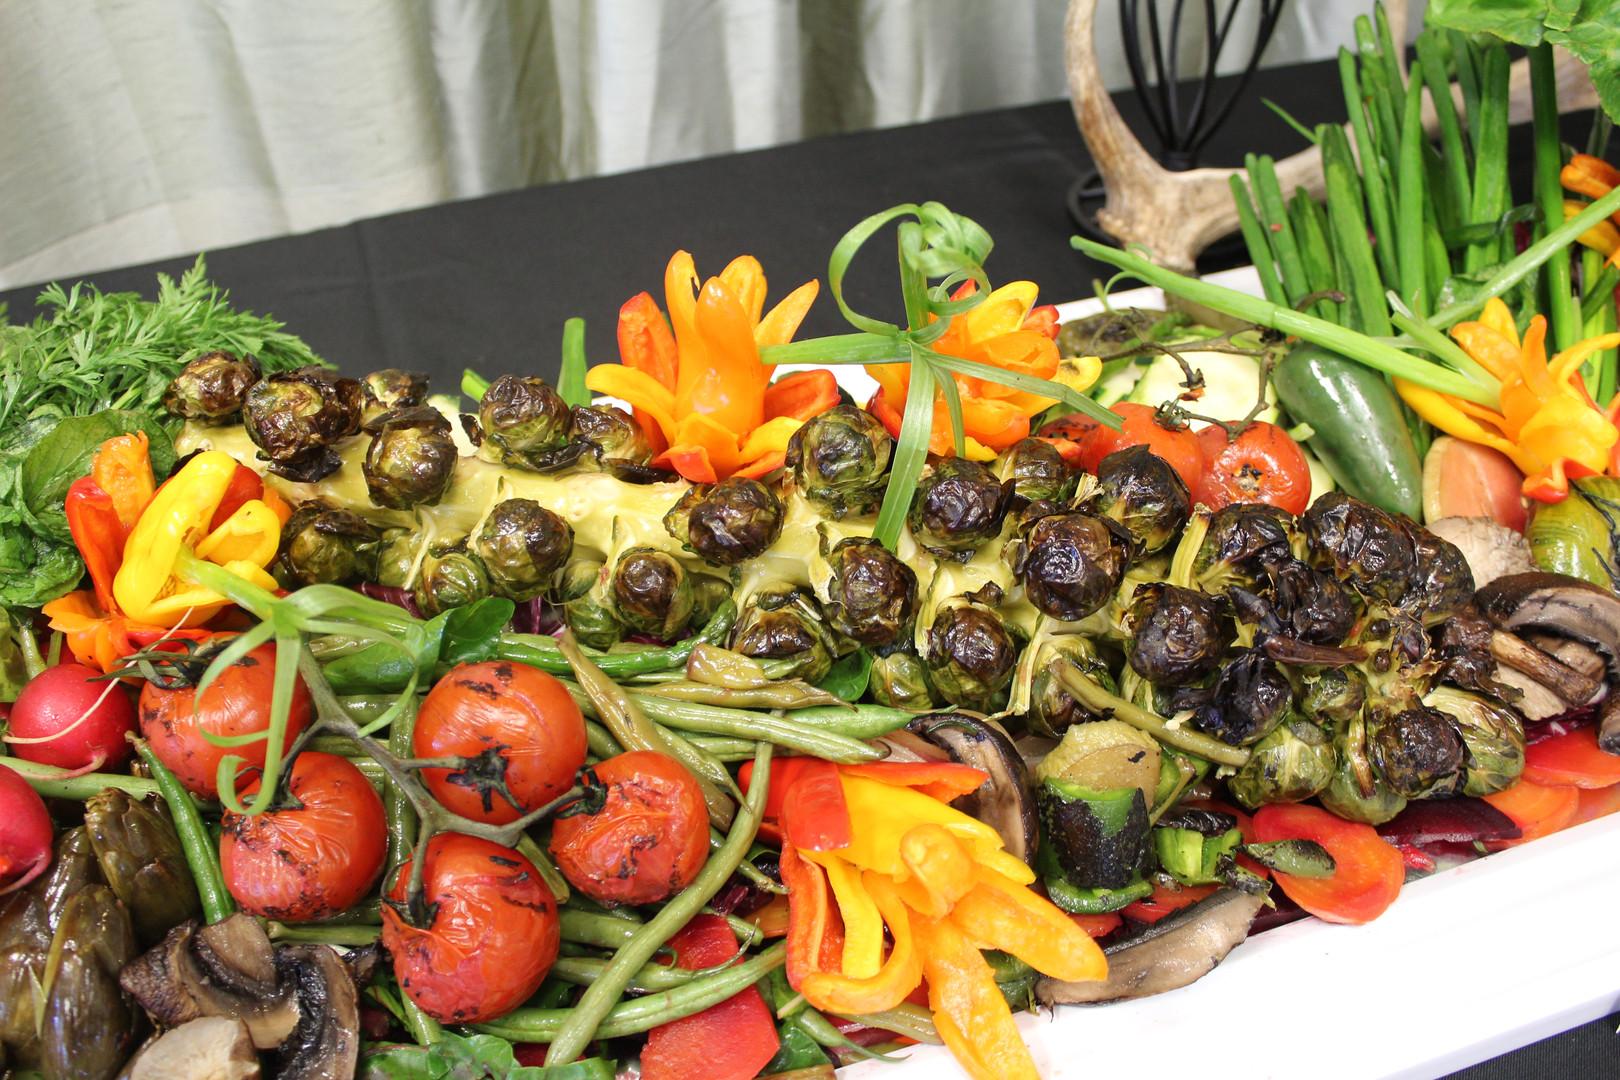 heirloom veggies